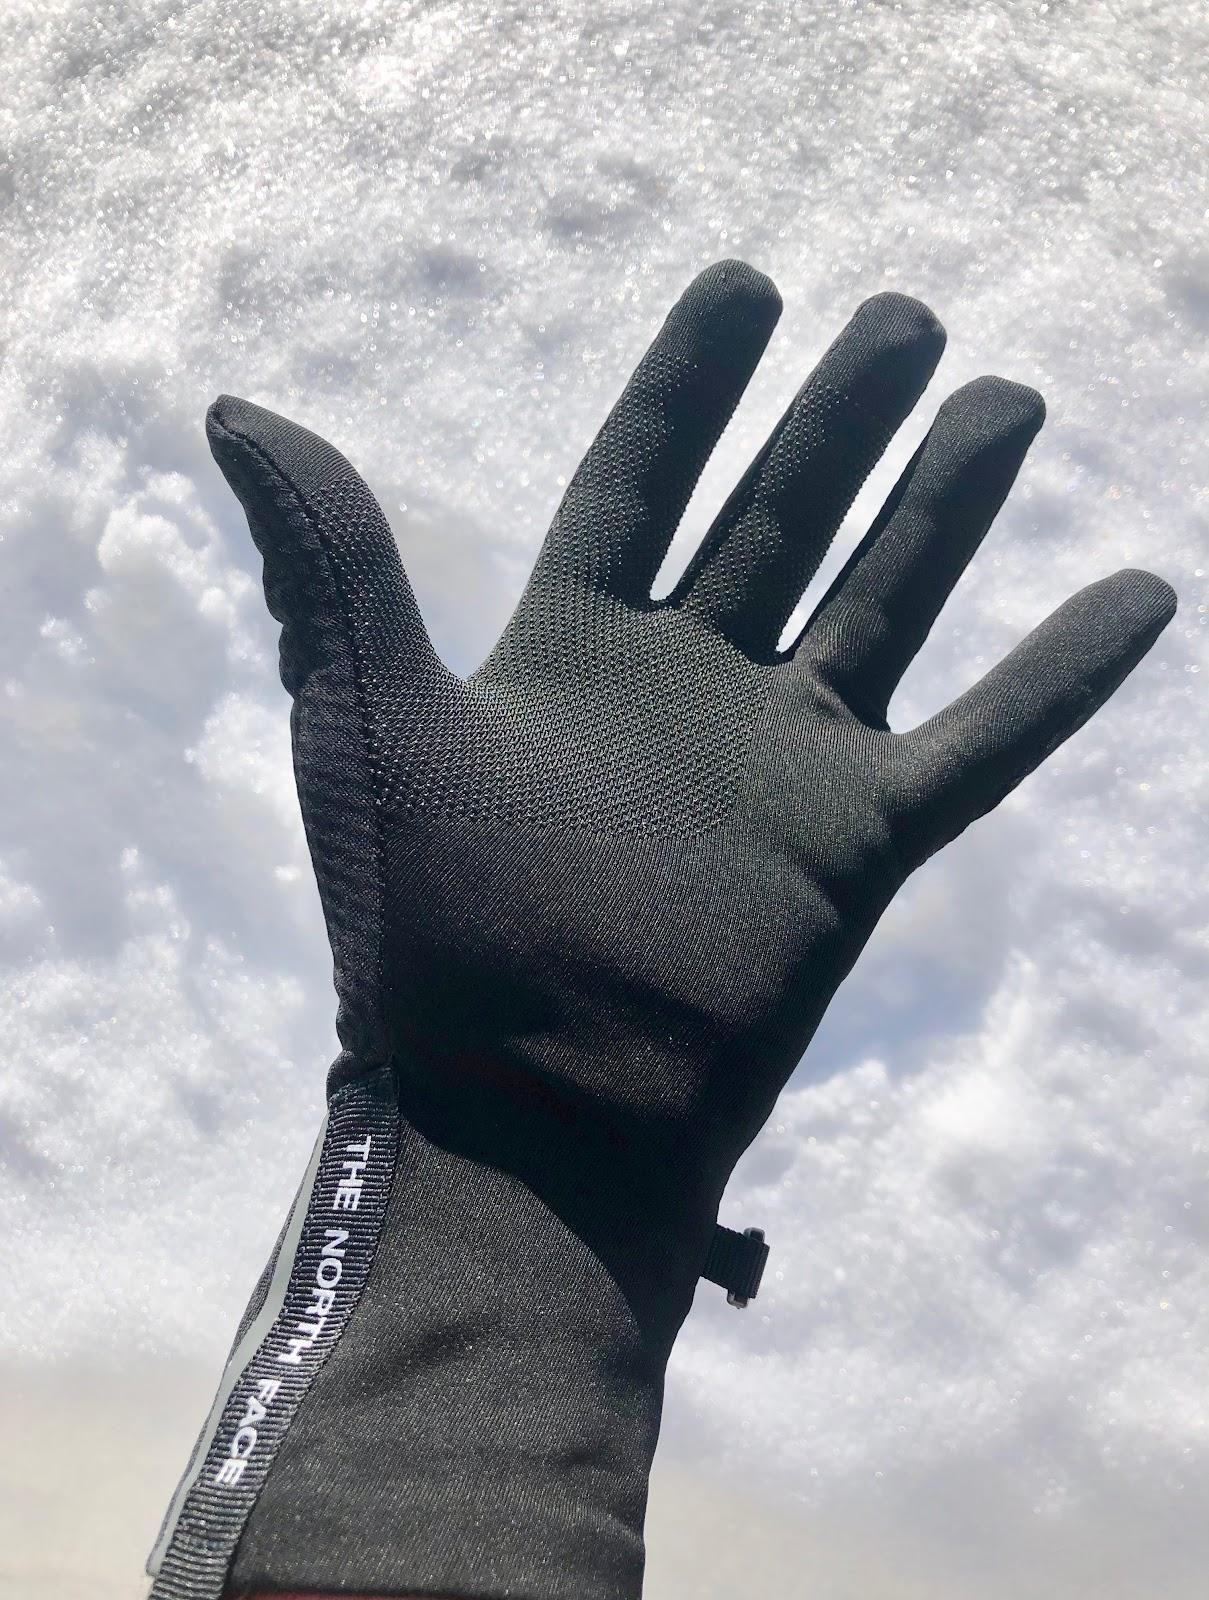 a2e493a91 Road Trail Run: The North Face Gore CloseFit Tricot Gloves Review ...